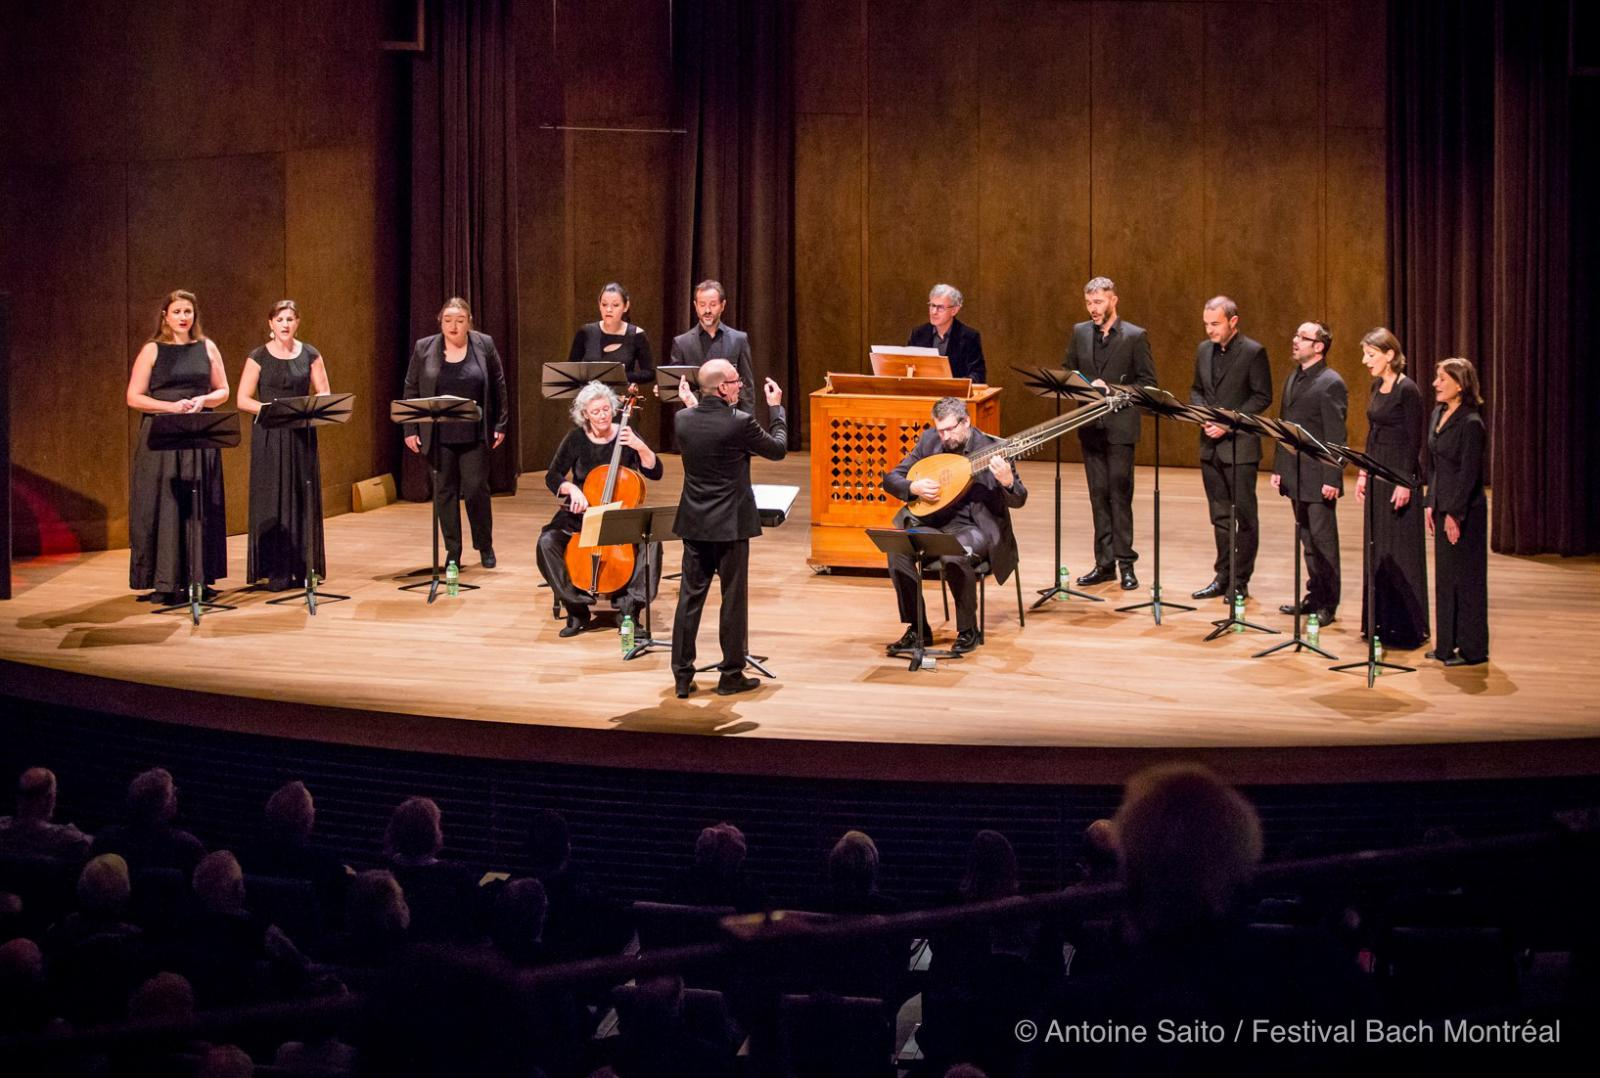 Génération 1685 Bach/Scarlatti - LEIPZIG. NAPLES. LISBONNE -